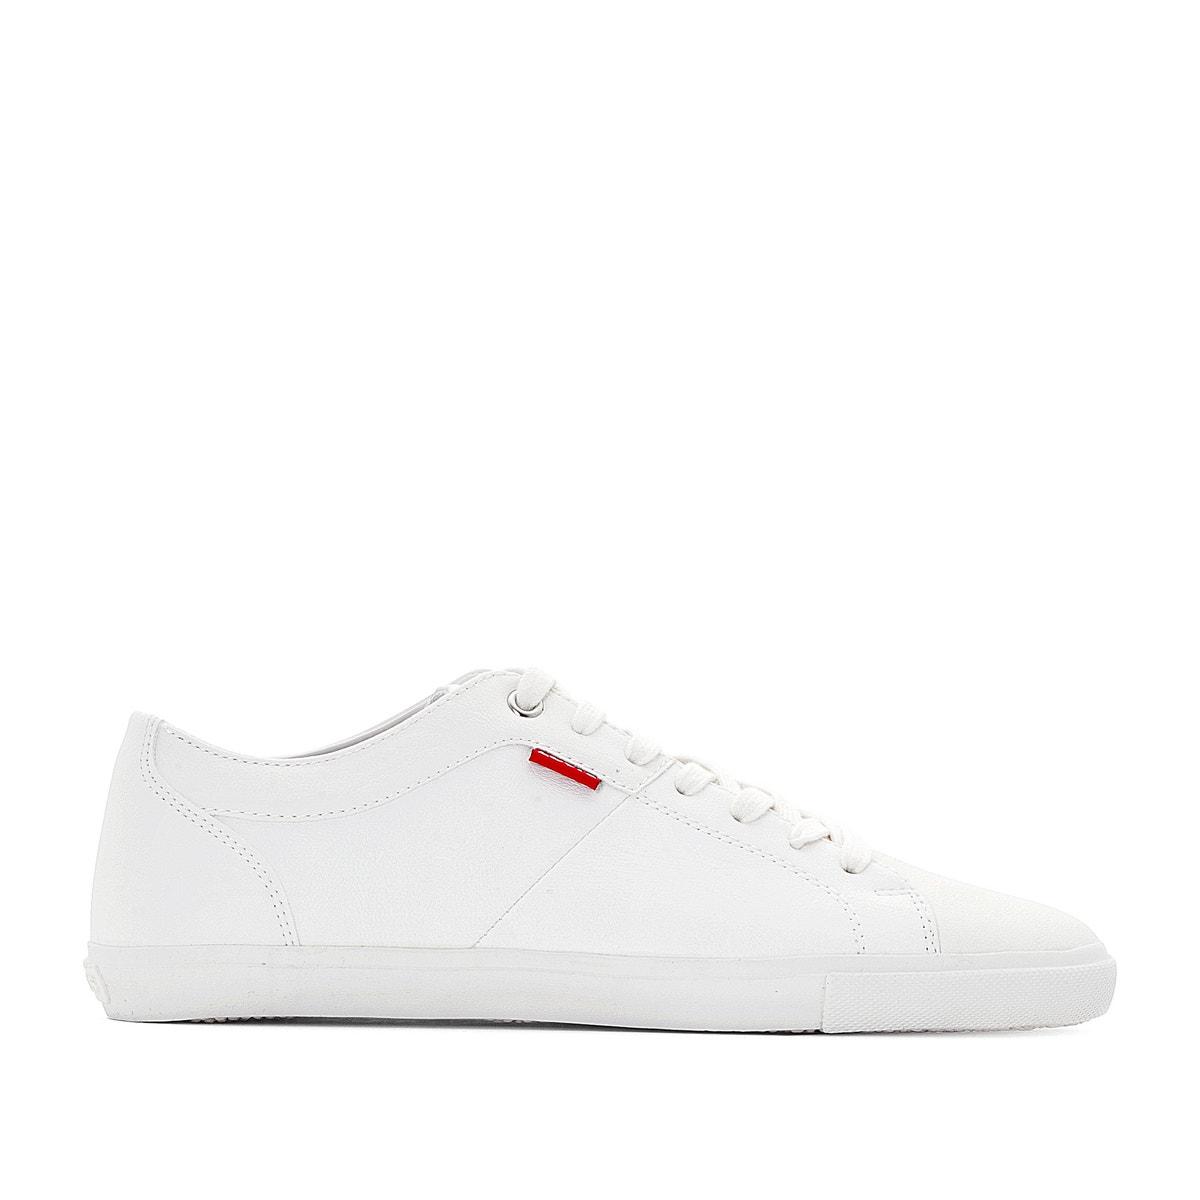 3198d63e4ea Ανδρικά Αθλητικά & Sneakers | LEVI'S | Snif.gr